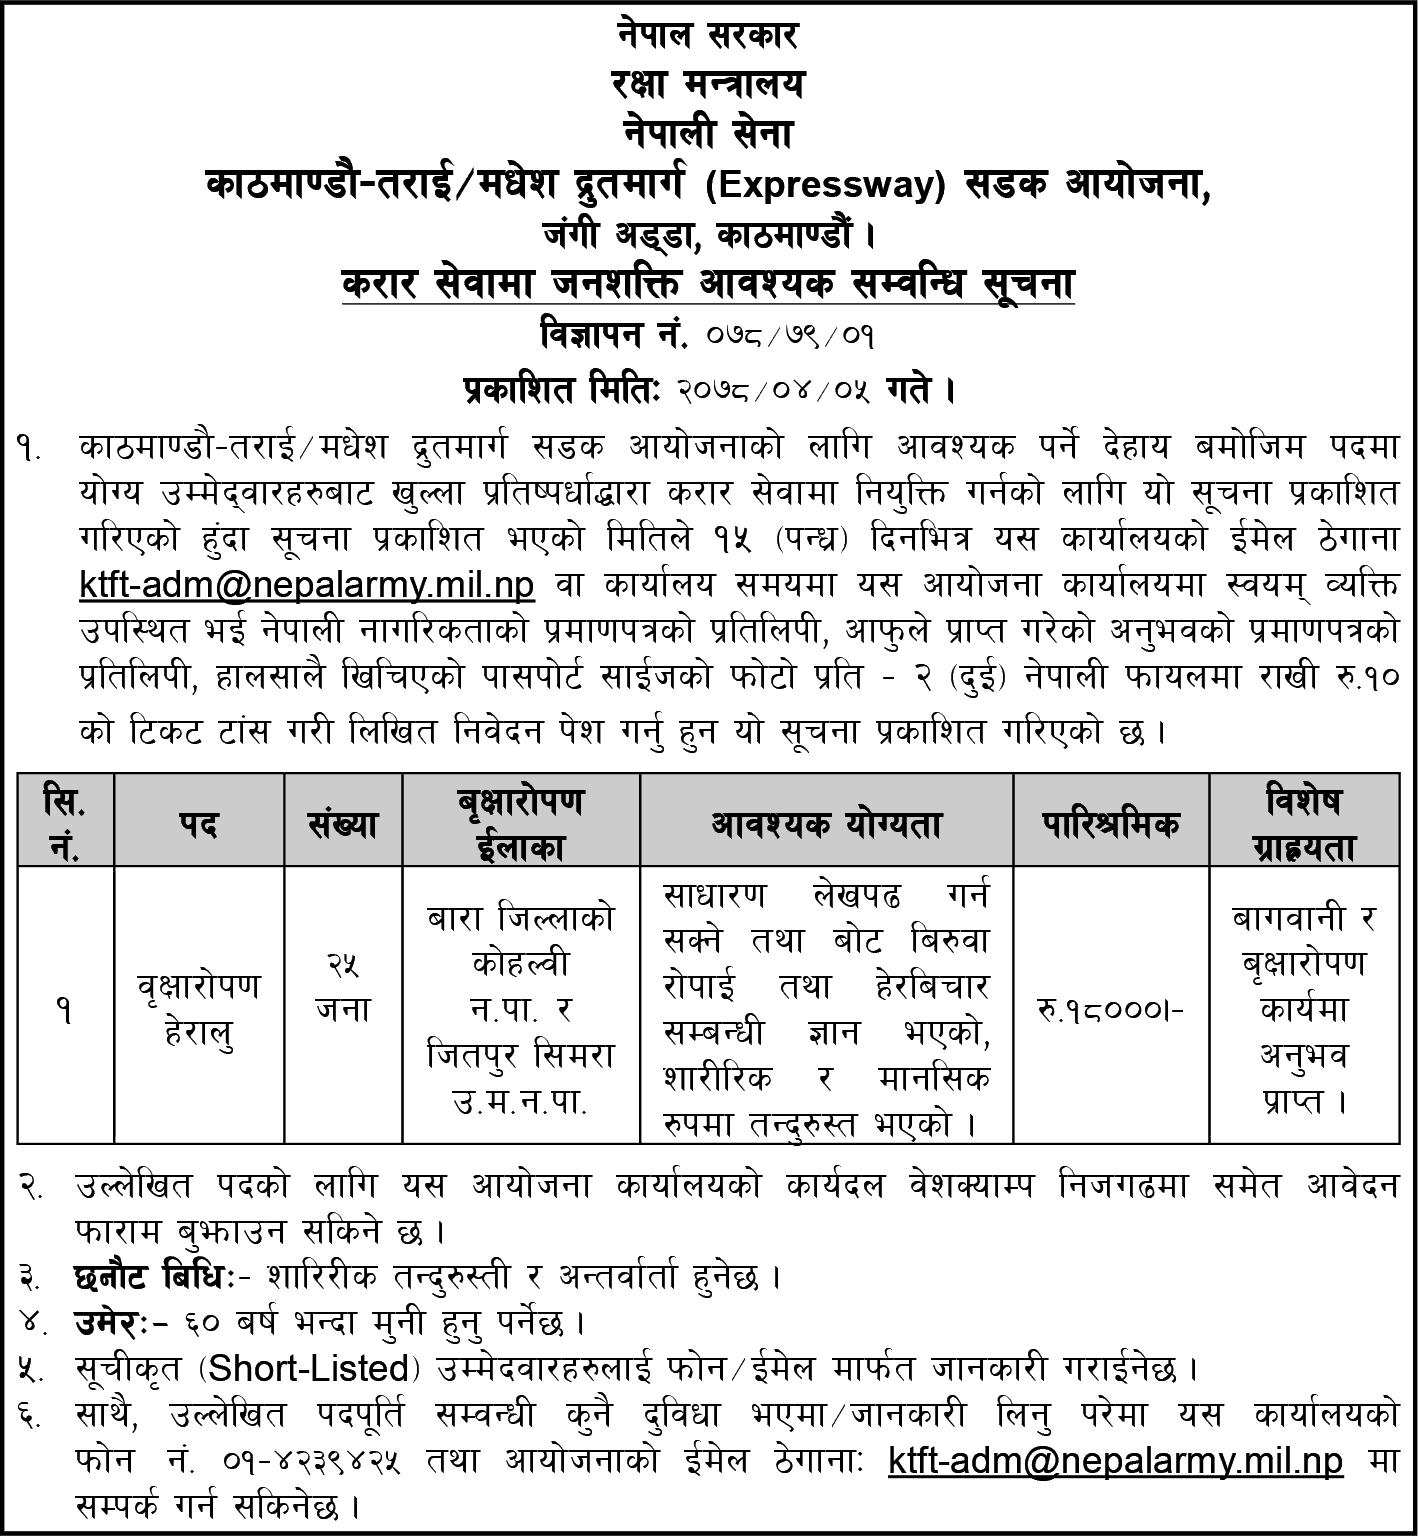 Nepal Army Vacancy Announcement for Kathmandu-Terai / Madhesh Expressway Road Project